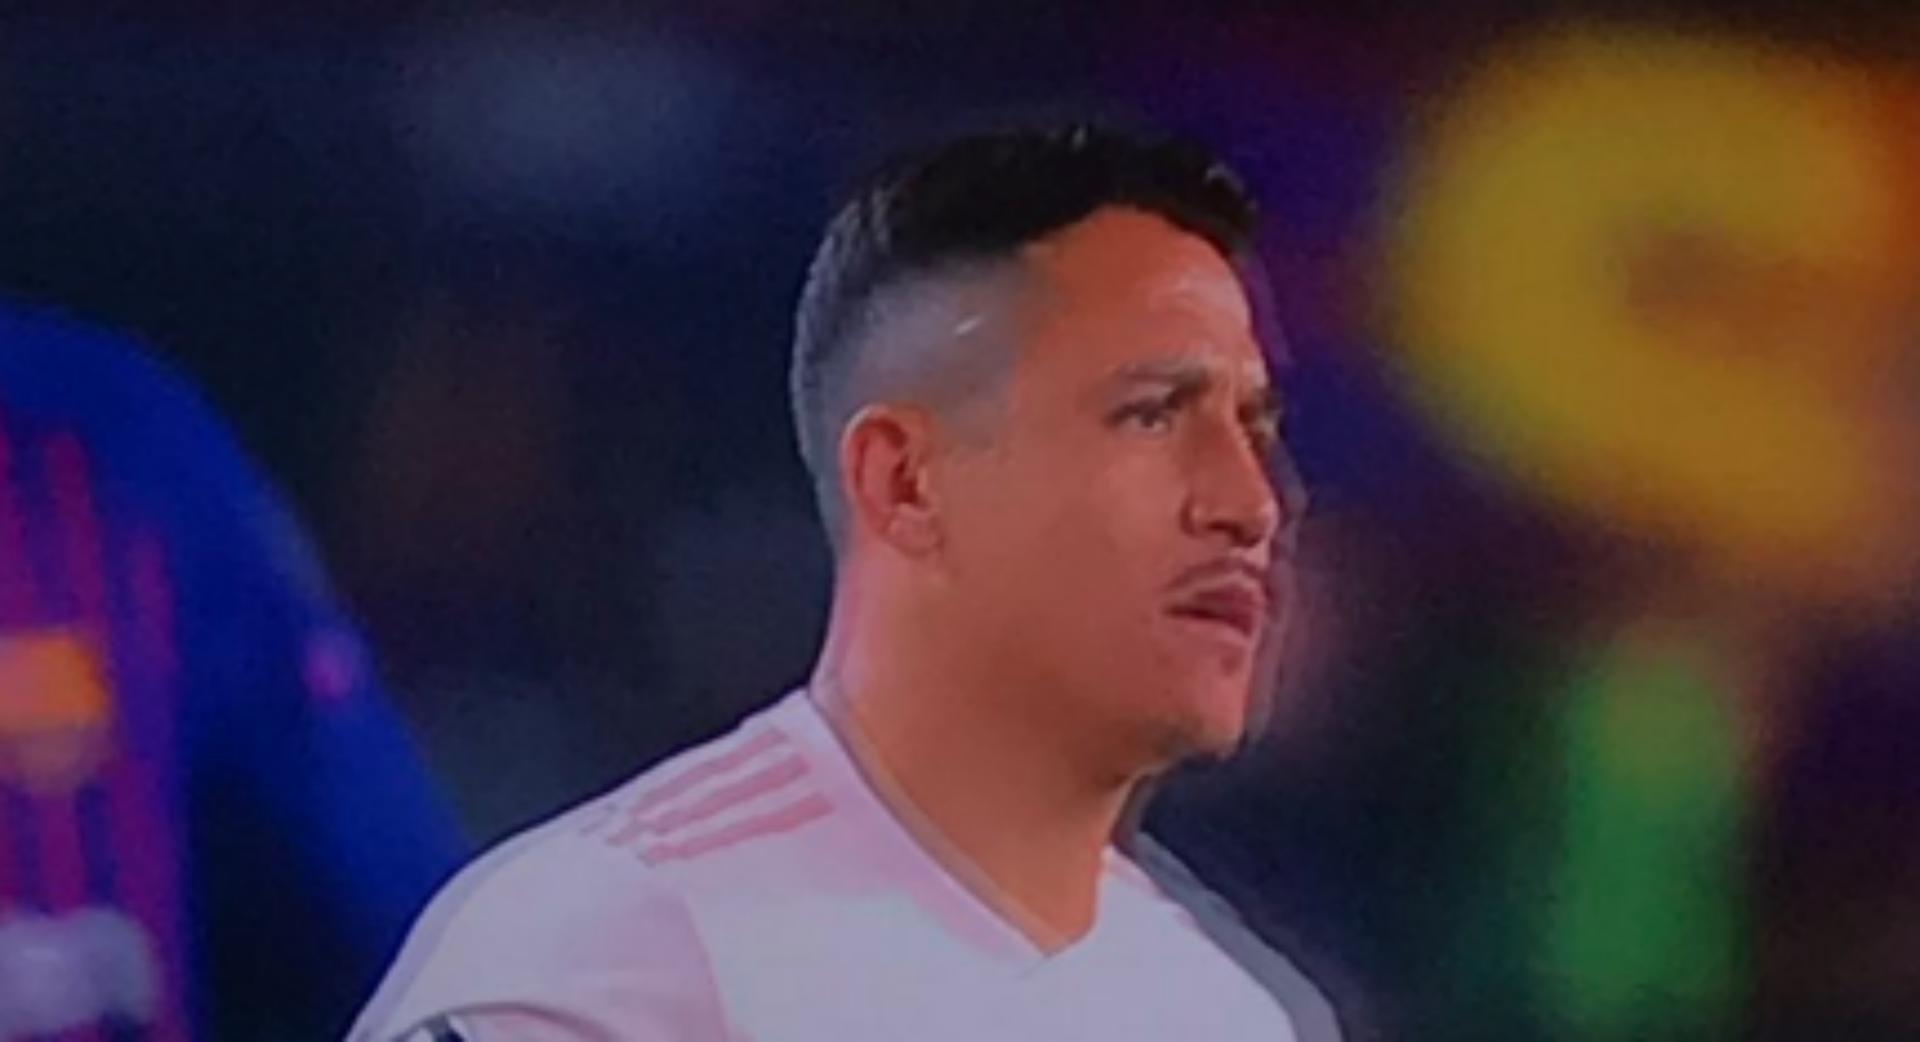 160419 Alexis Sánchez Barcelona Manchester United